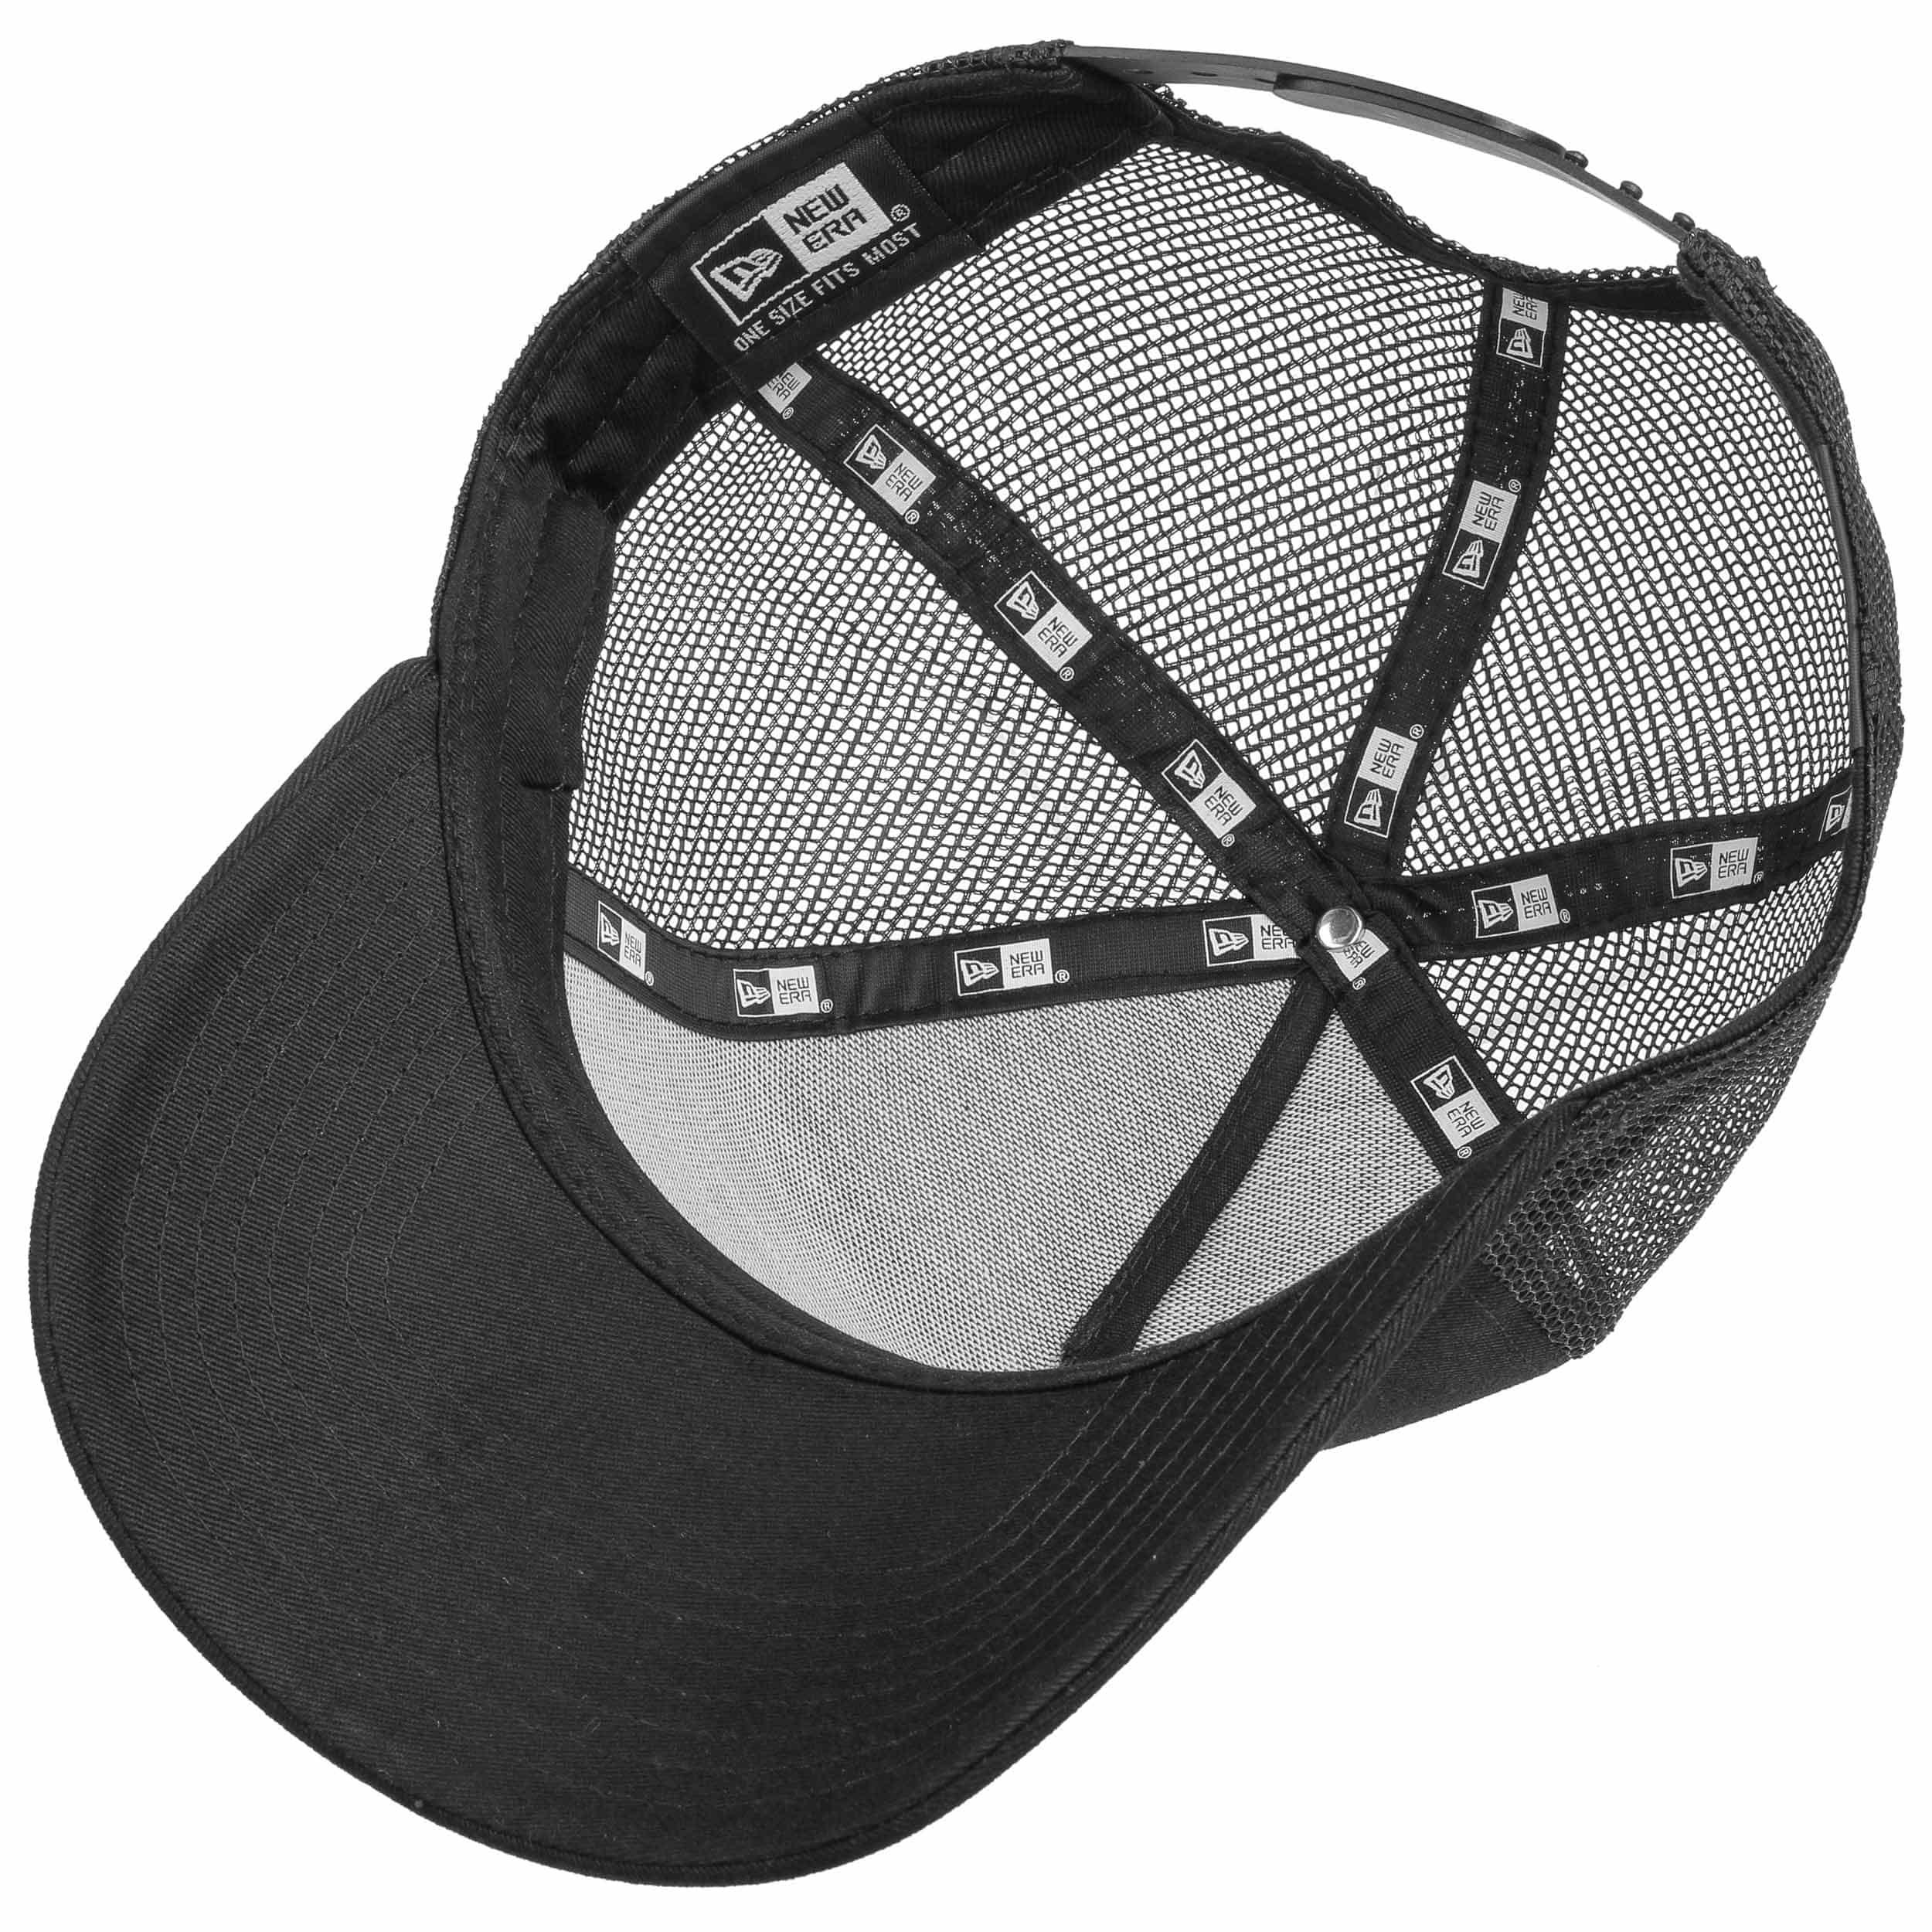 779b2a4f2 League Ess NY Yankees Trucker Cap by New Era